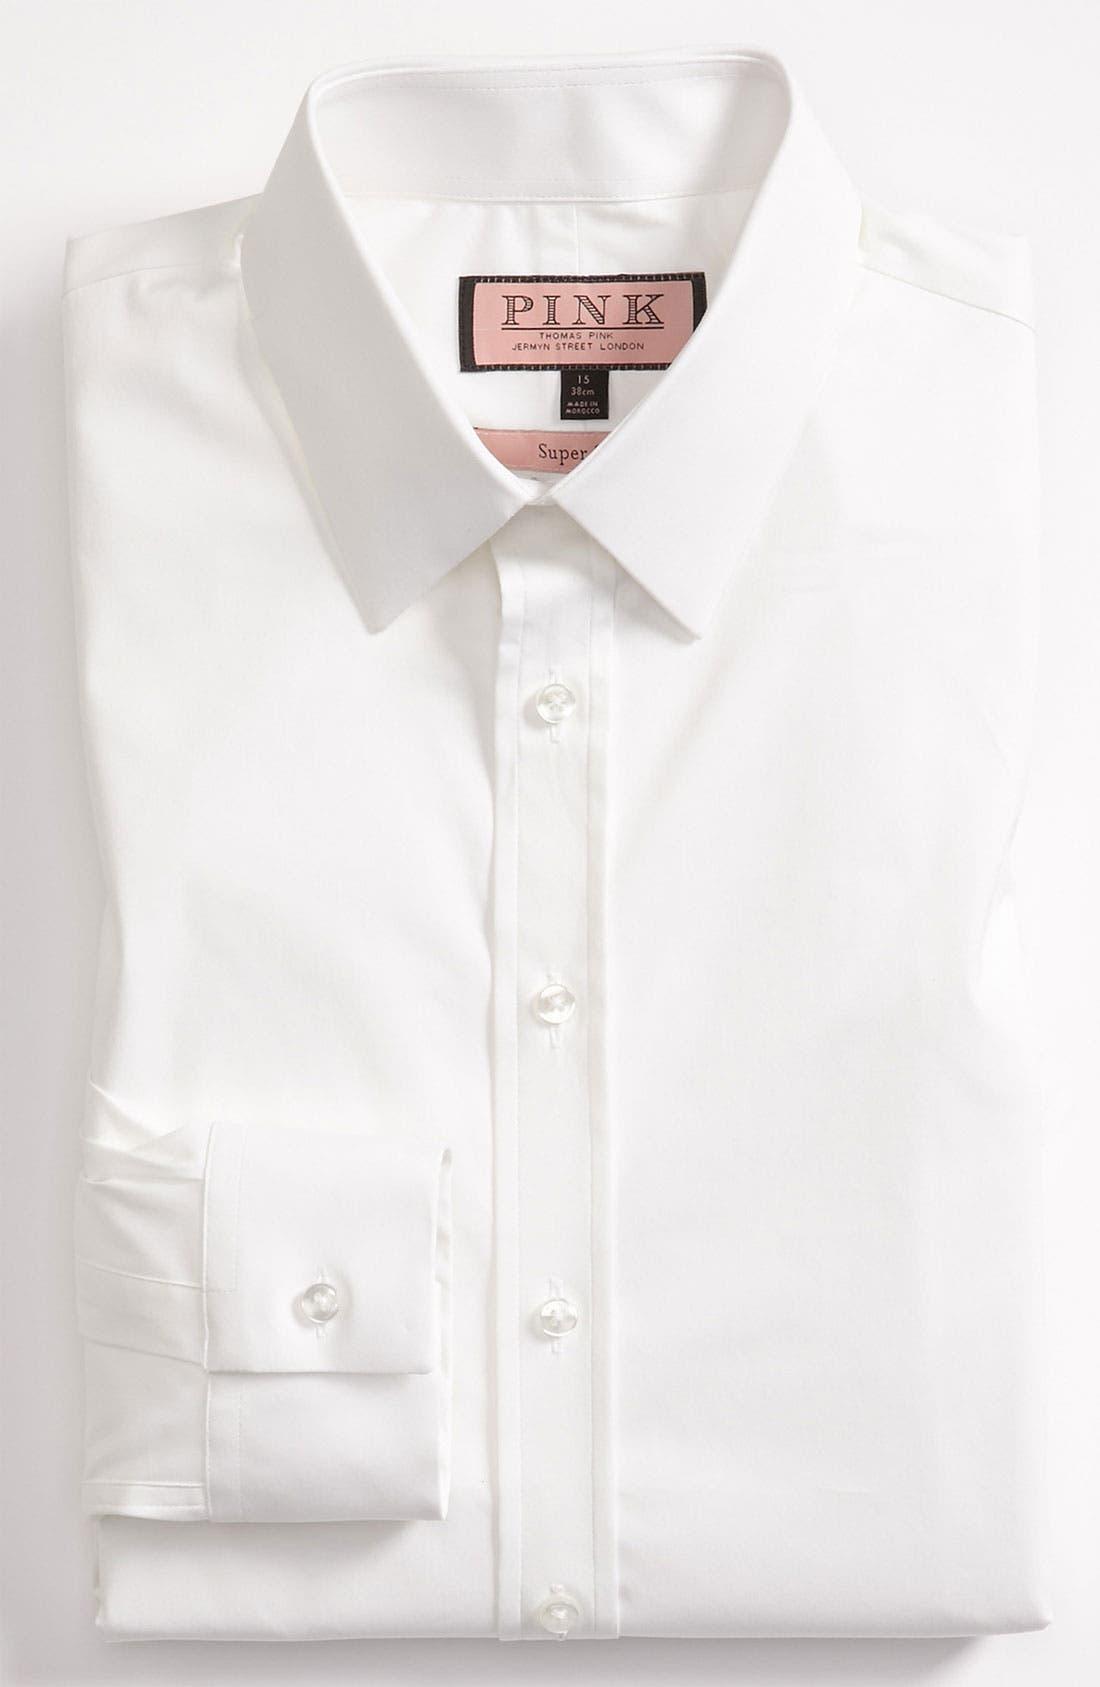 Main Image - Thomas Pink Super Slim Fit Dress Shirt